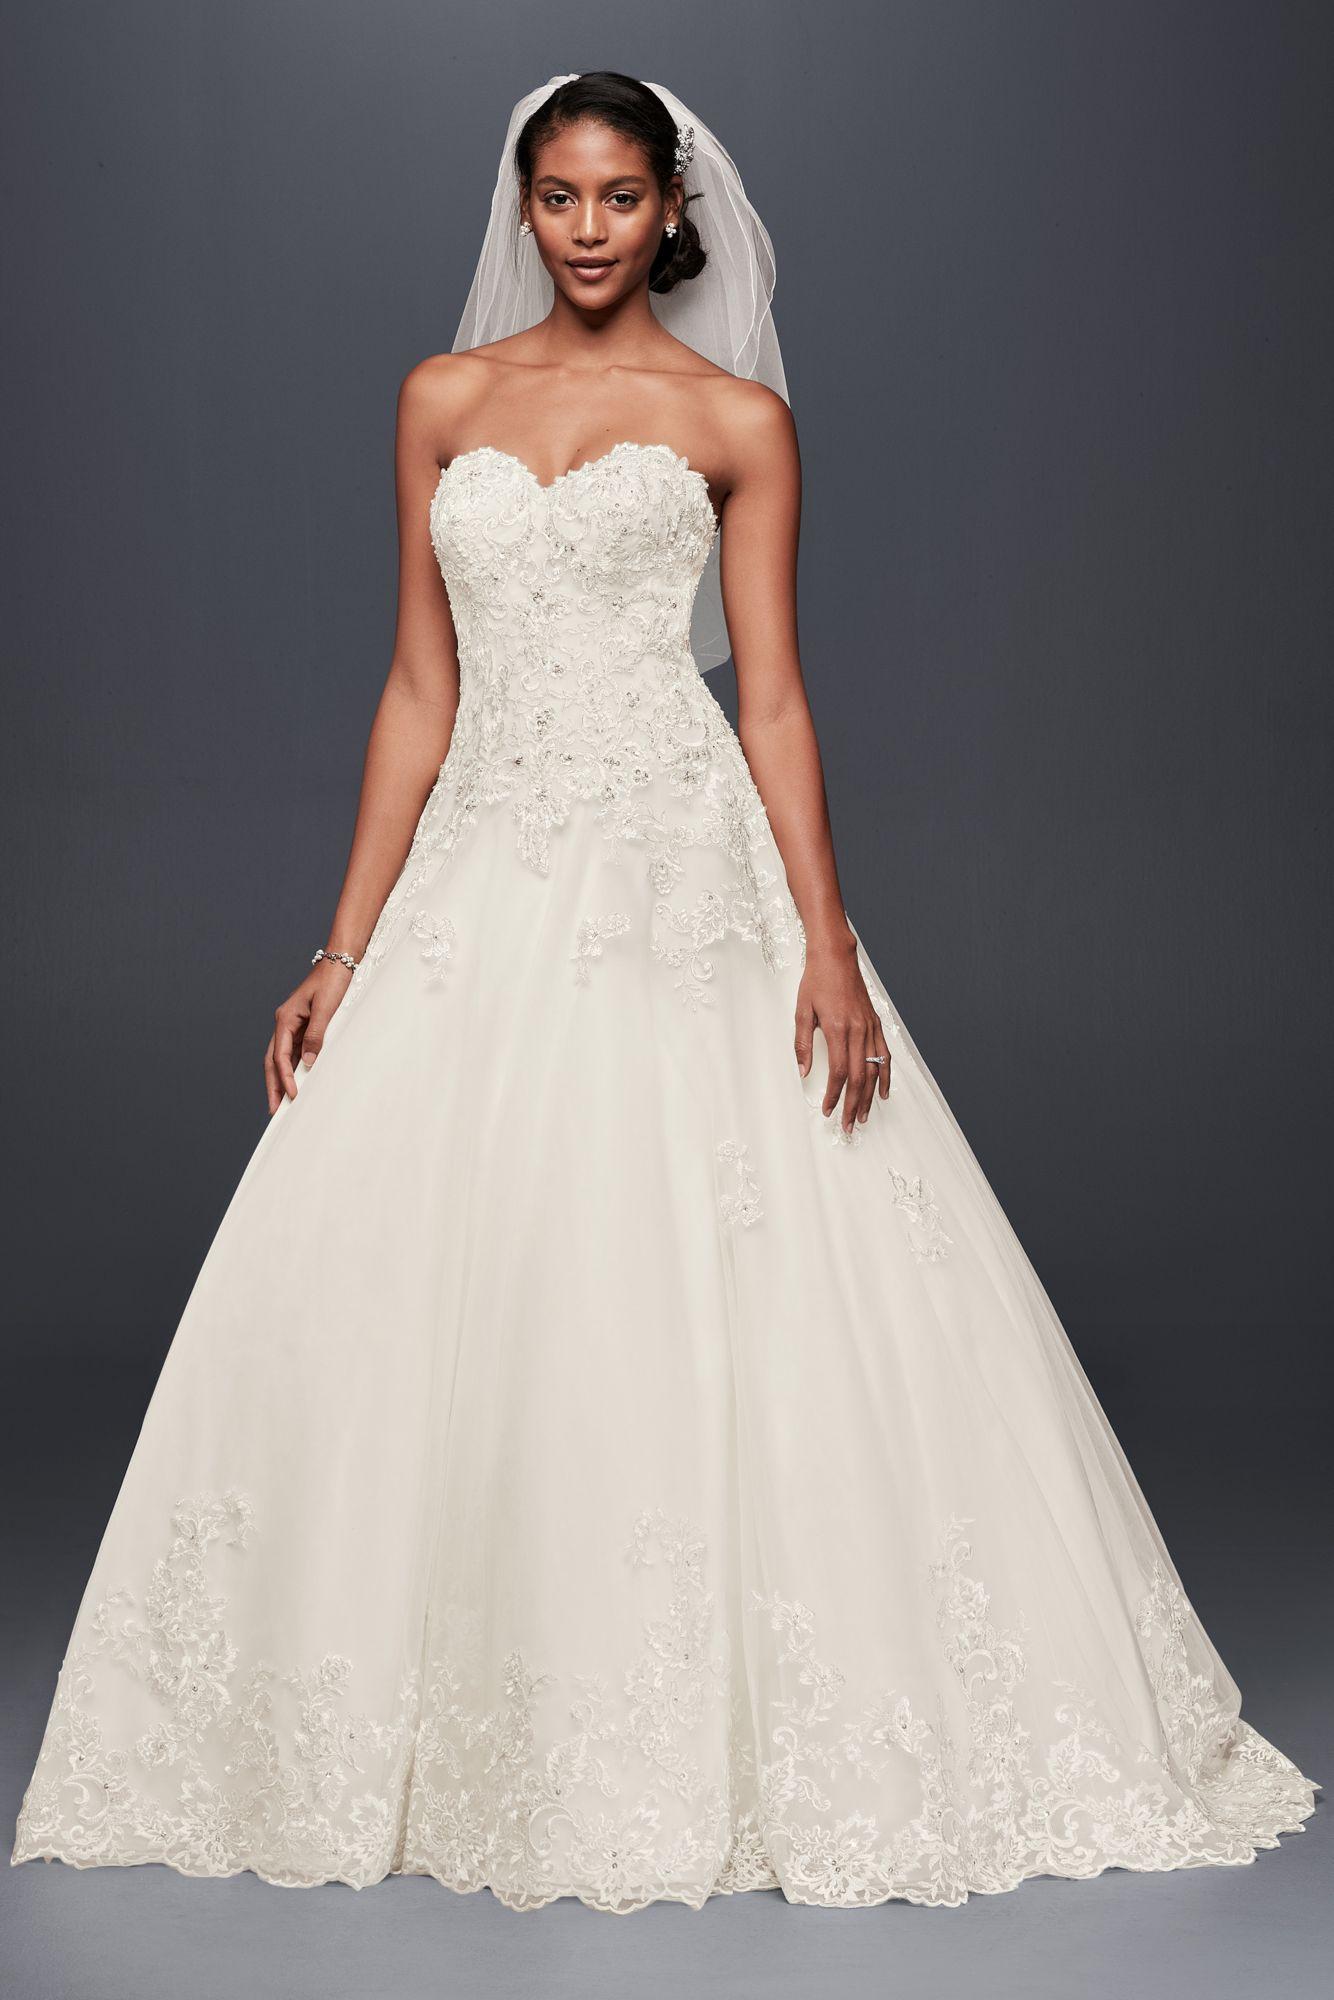 davids bridal ball gown wedding dresses photo - 1